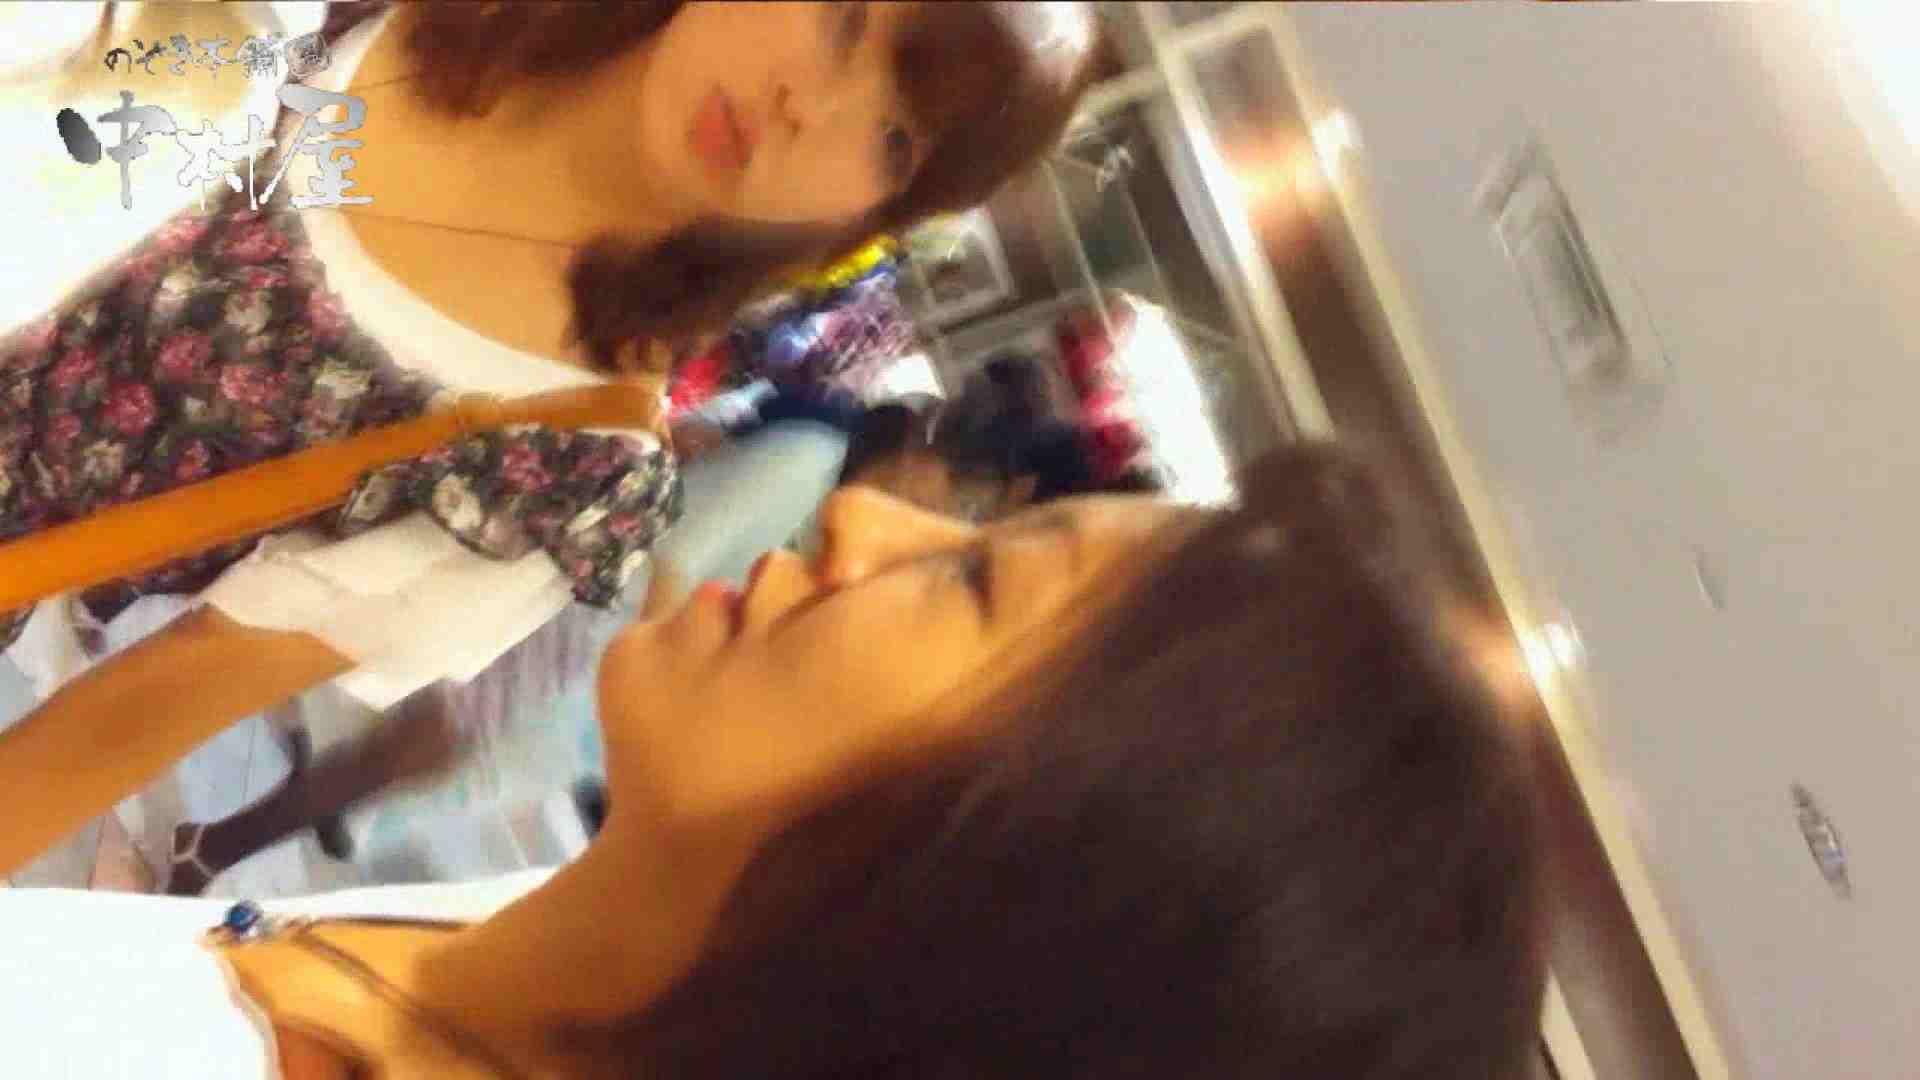 vol.56 美人アパレル胸チラ&パンチラ メガネオネーサマの下着 接写 のぞきおめこ無修正画像 82PICs 75